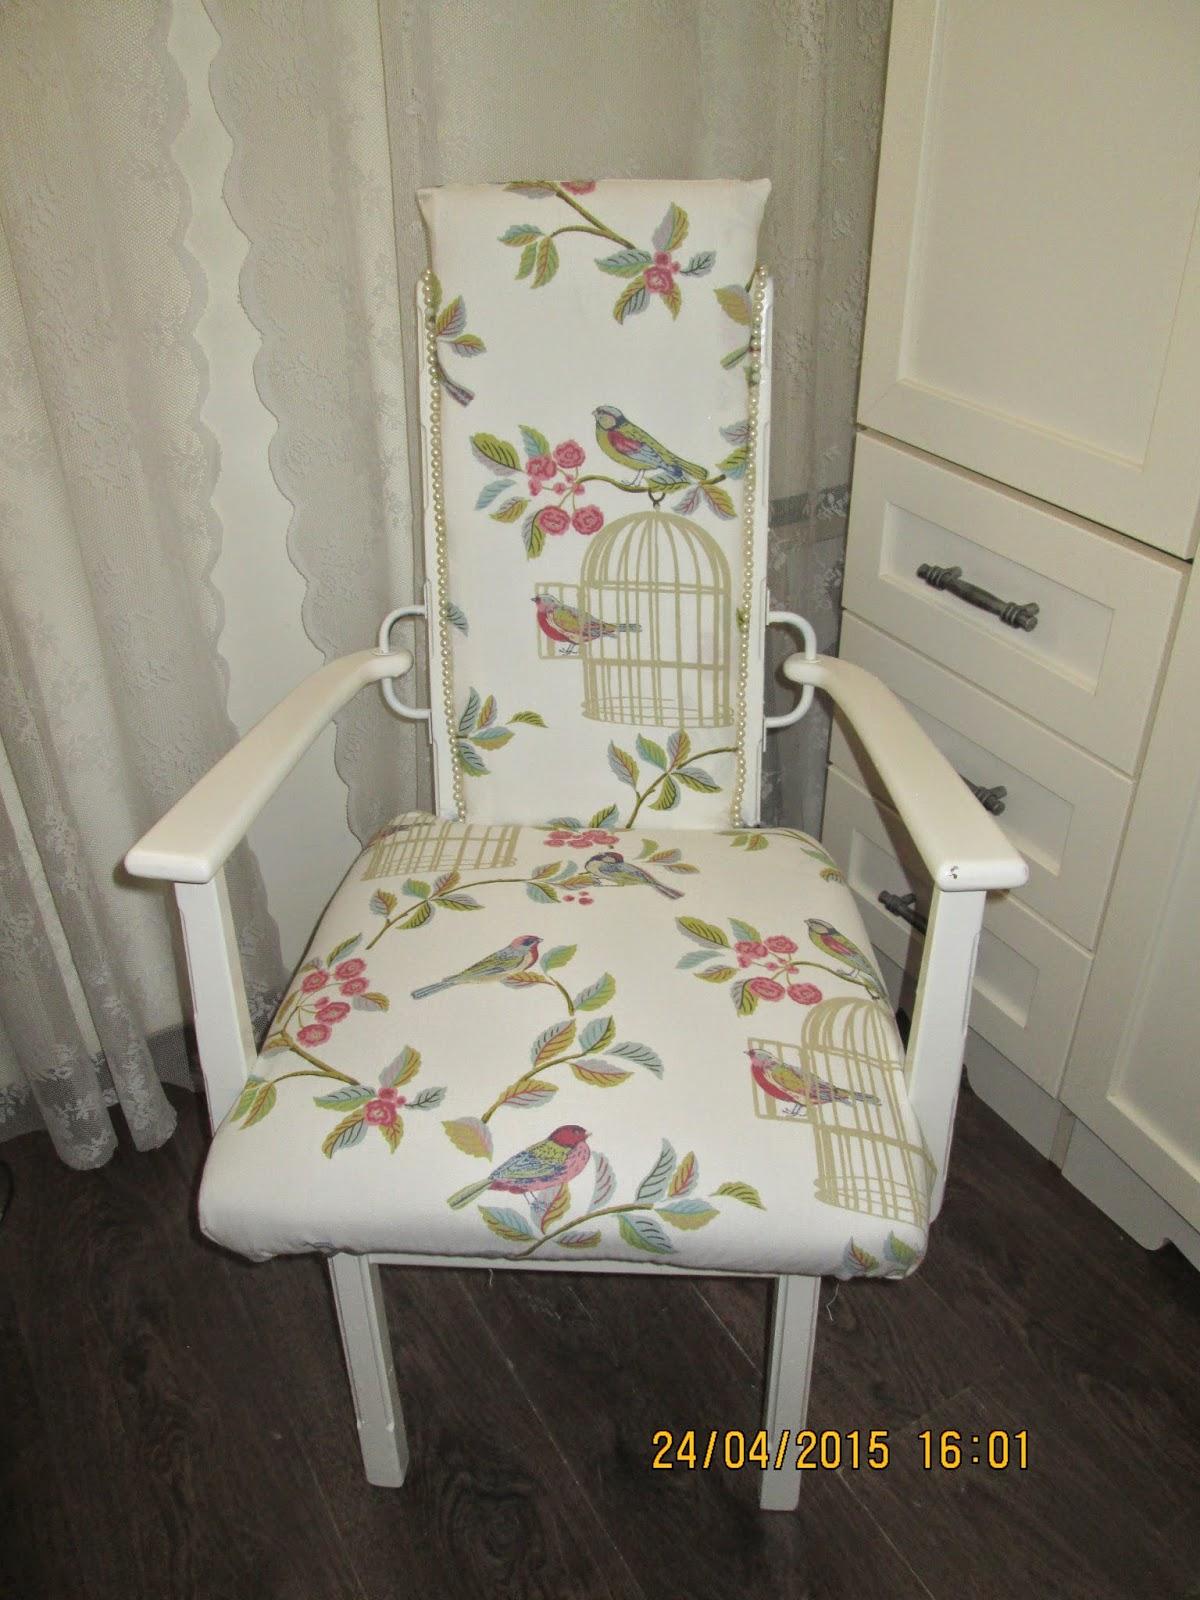 IMG 0062 - שדרוג כורסא ישנה